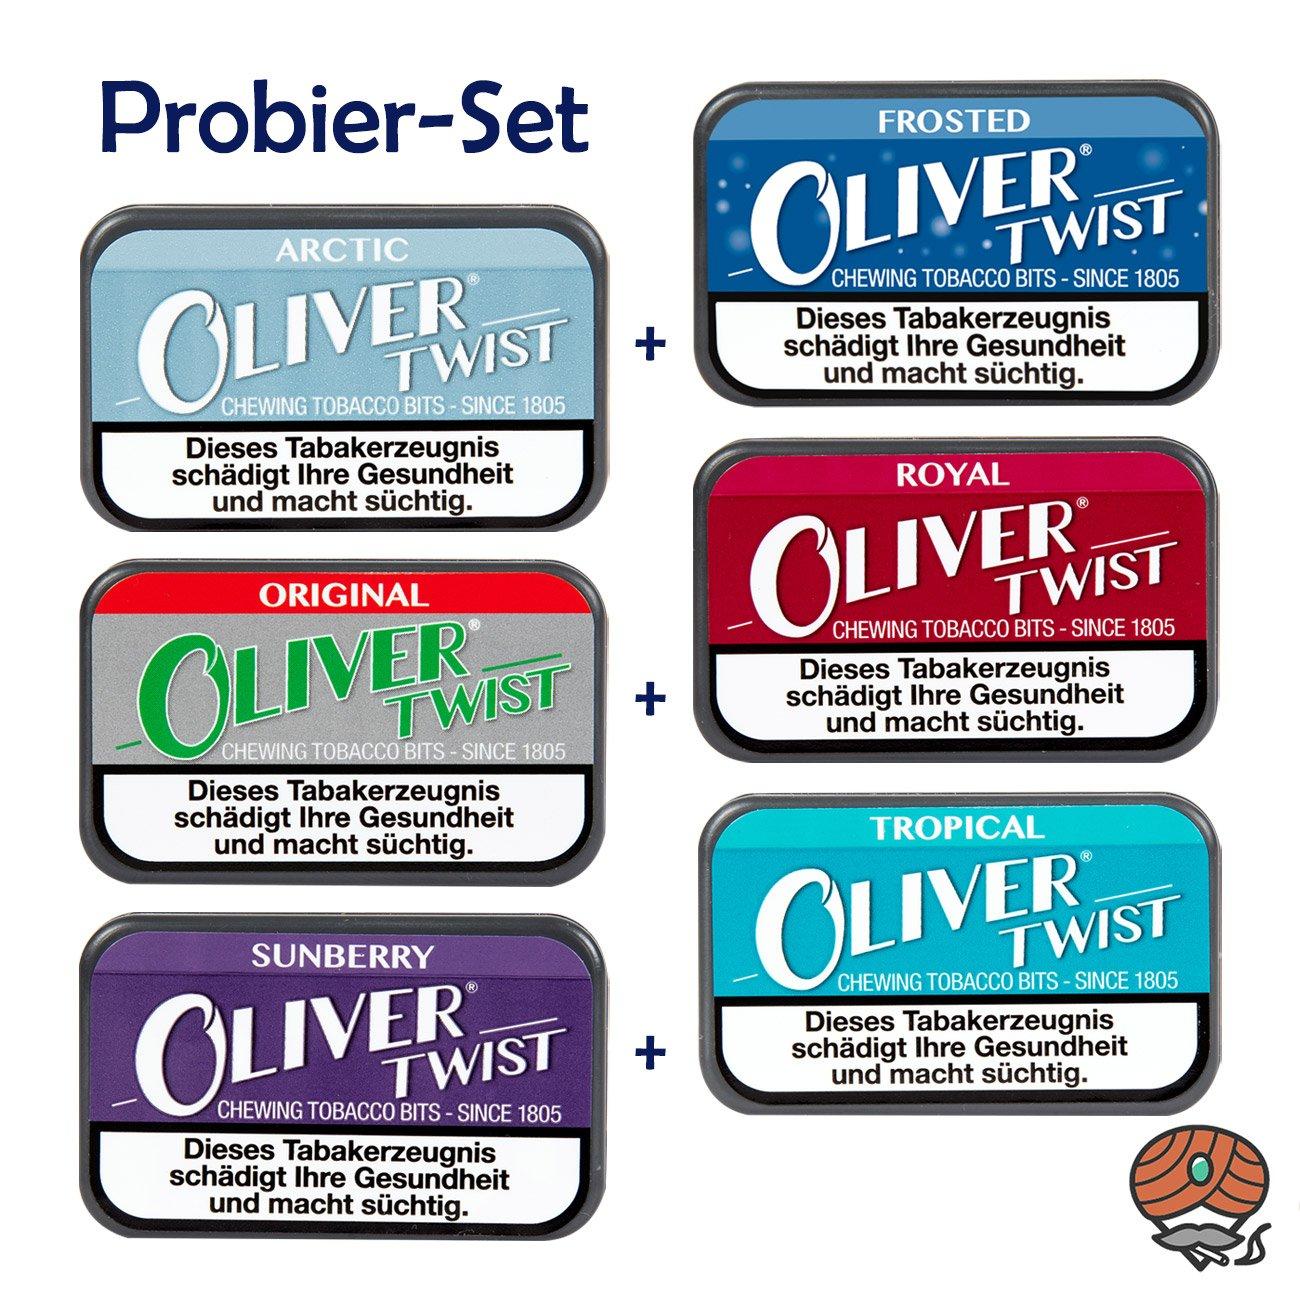 6 Dosen Oliver Twist Tabakpastillen, Kautabak, Chewing Bits, PROBIERSET